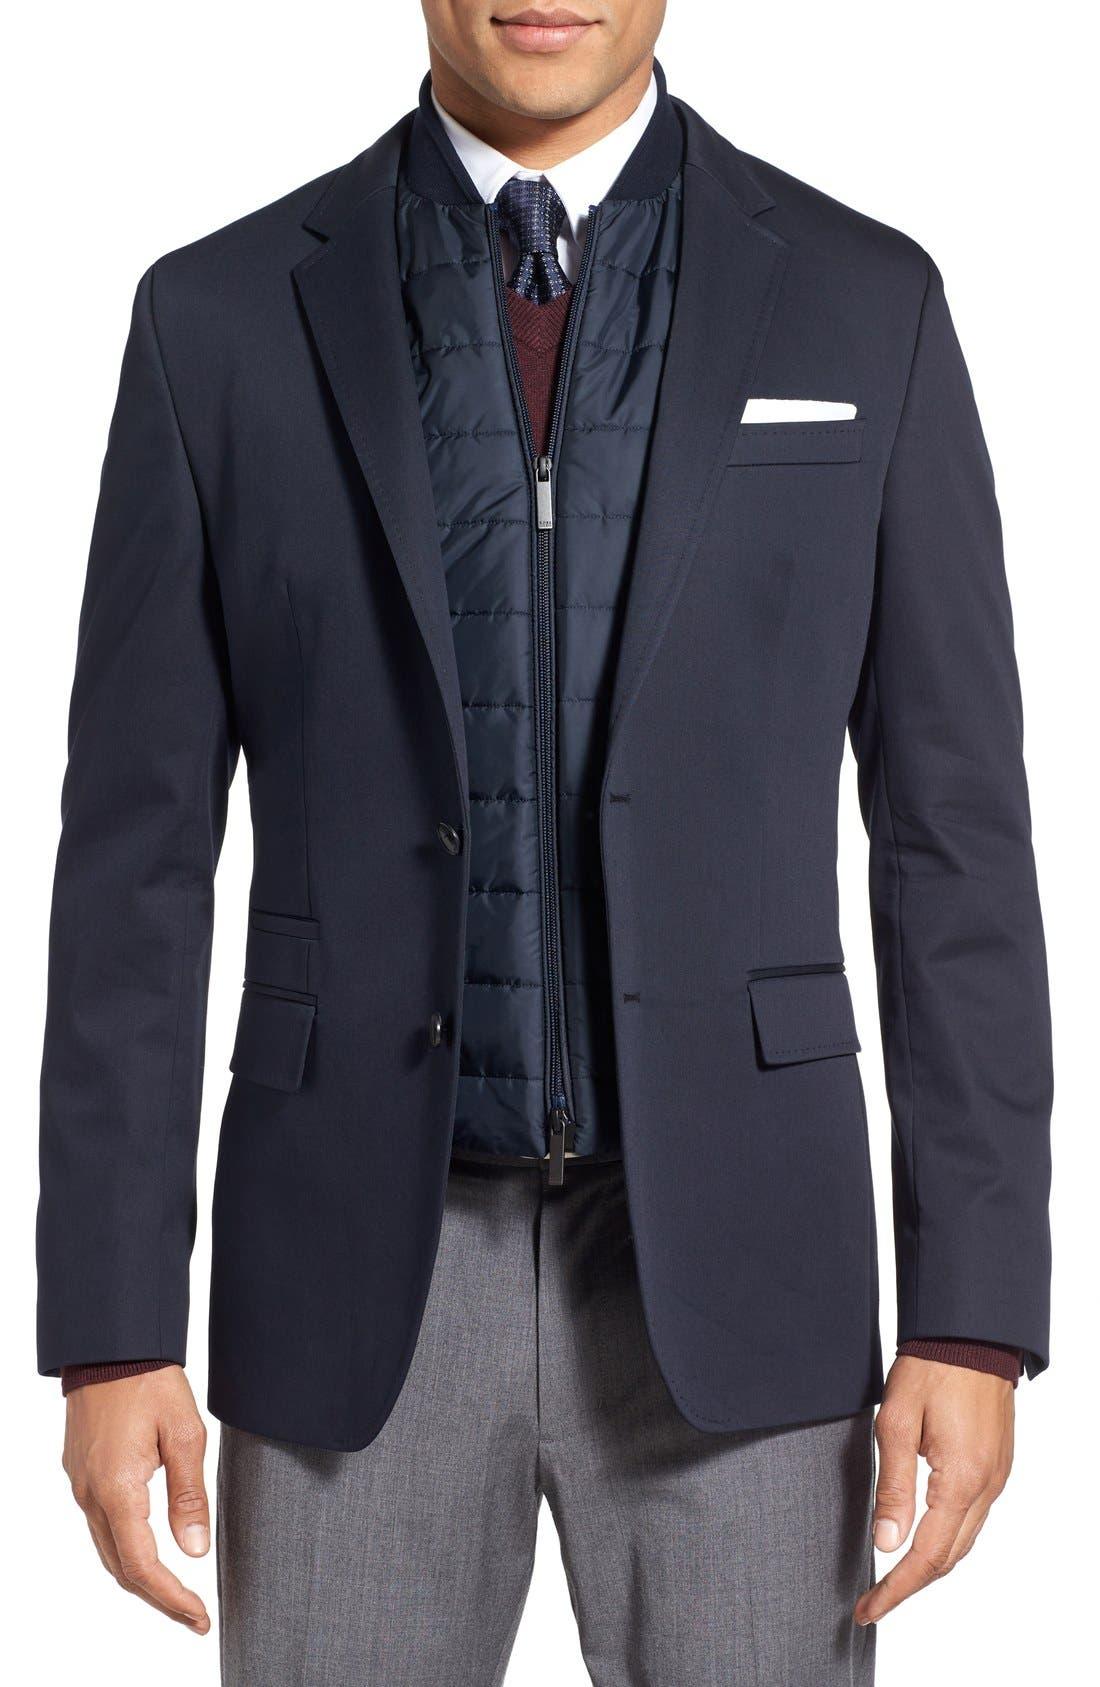 Alternate Image 1 Selected - BOSS 'Hadwart' Trim Fit Cotton Blend Blazer